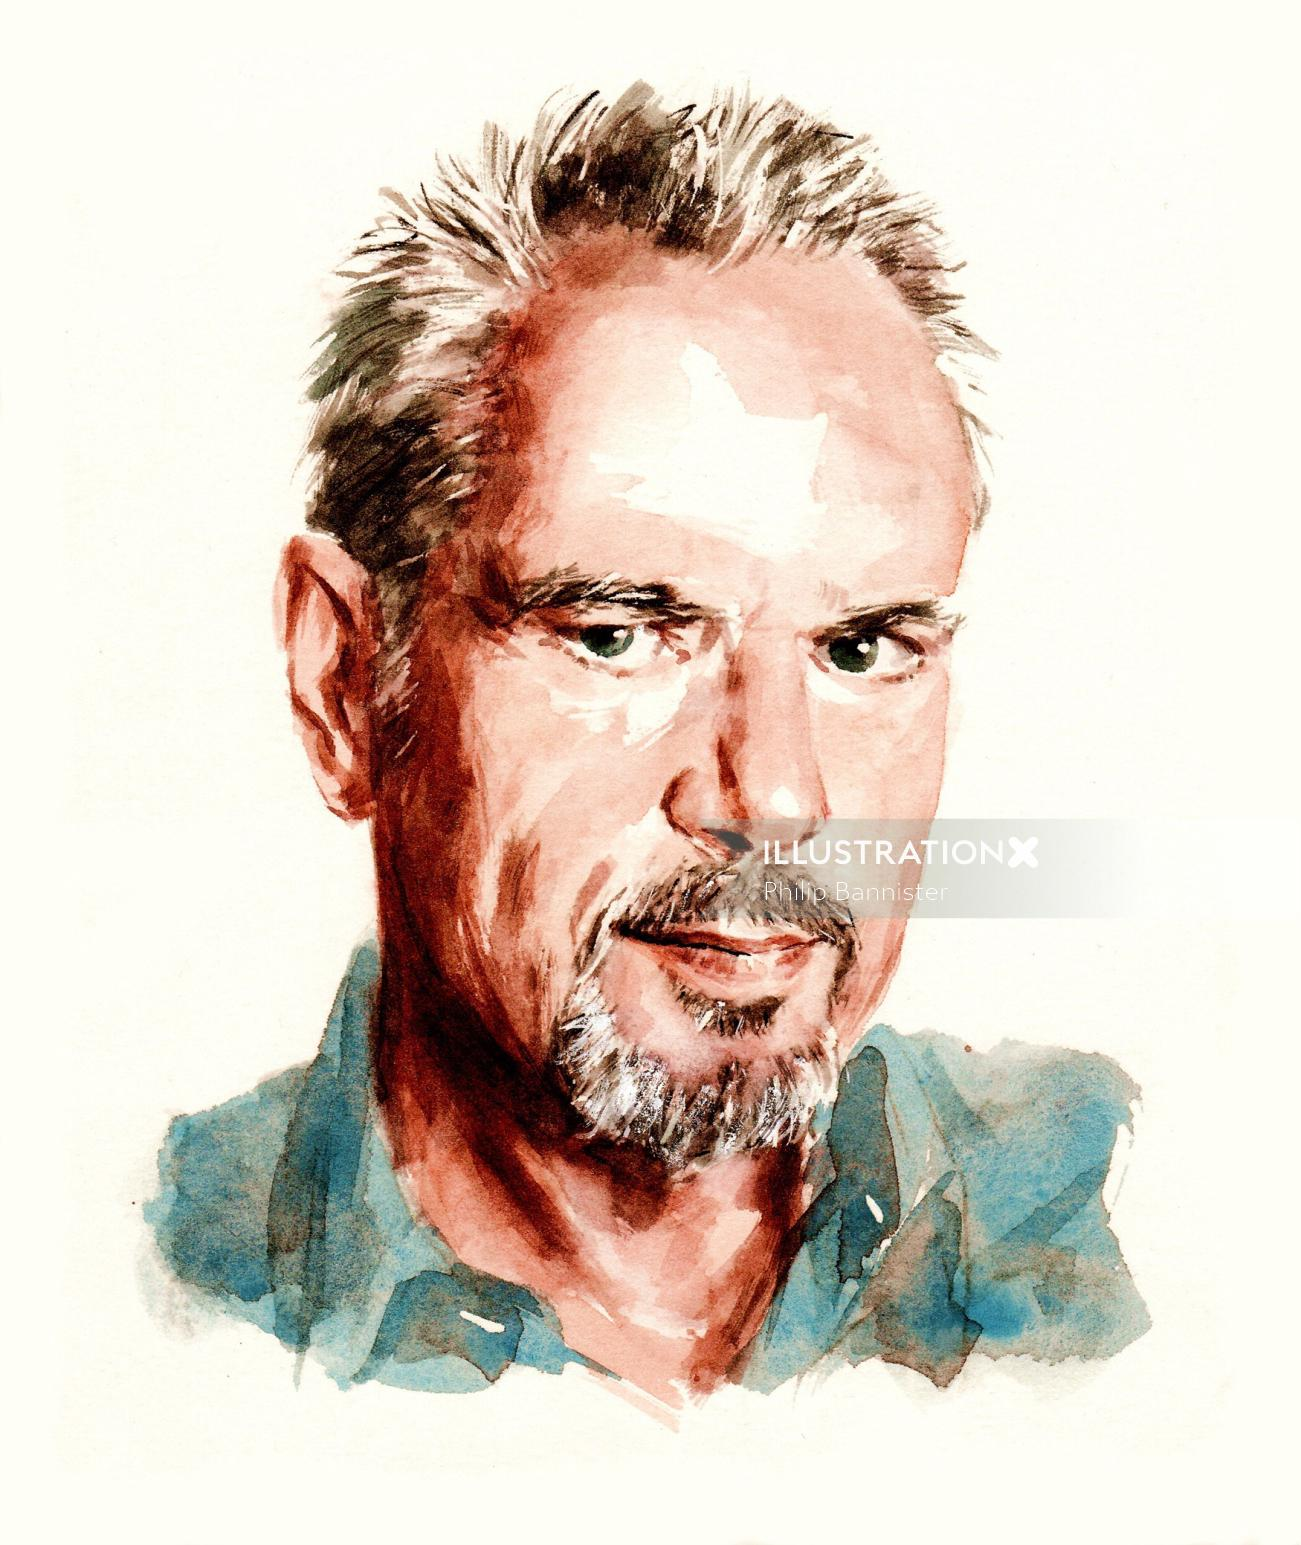 Portraiture Artists and Illustrators - Portraits of famous ...